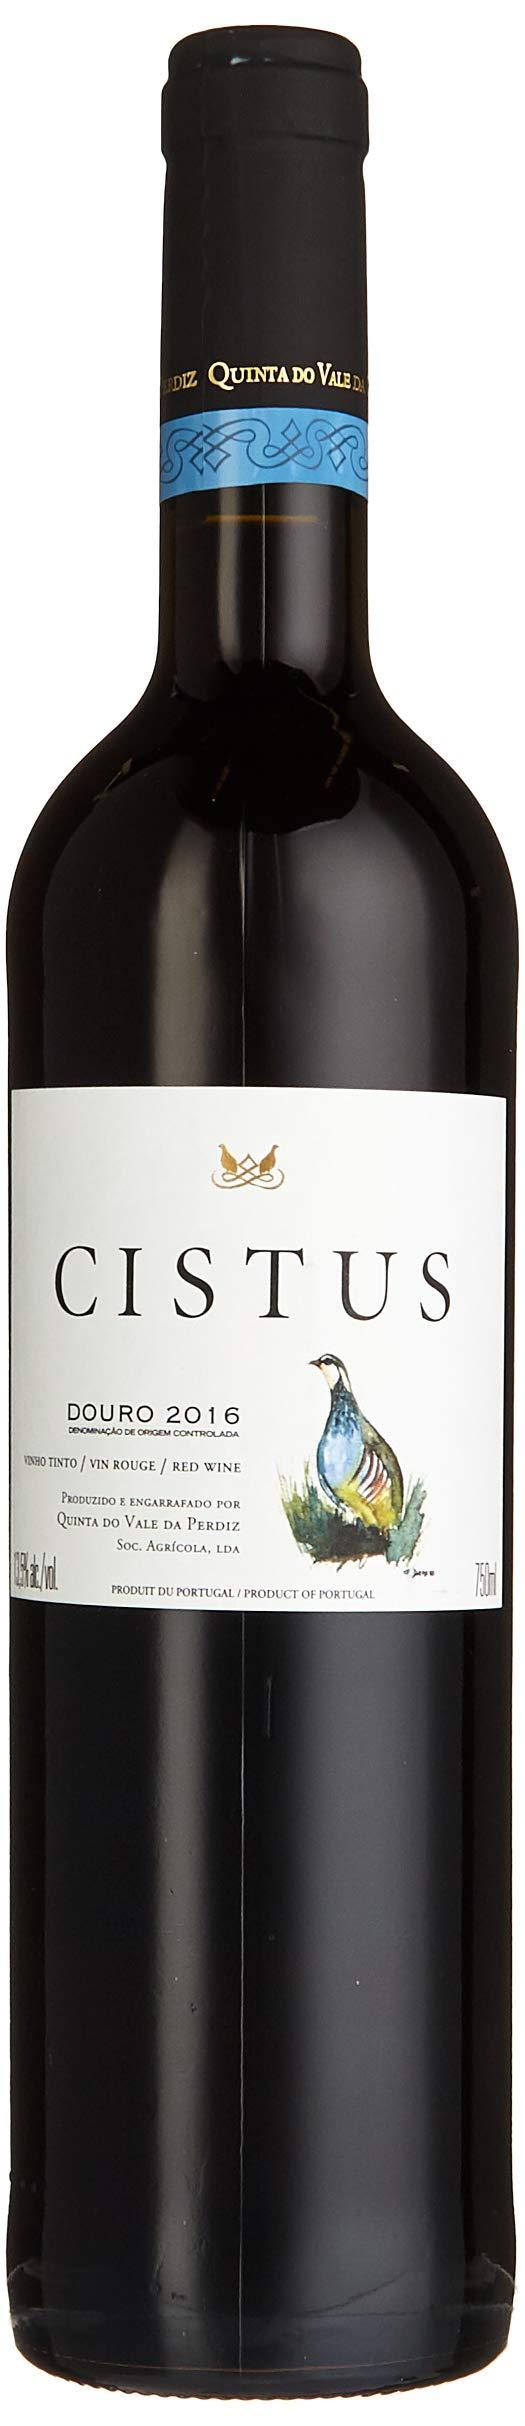 2013-Cistus-Tinto-Portugal